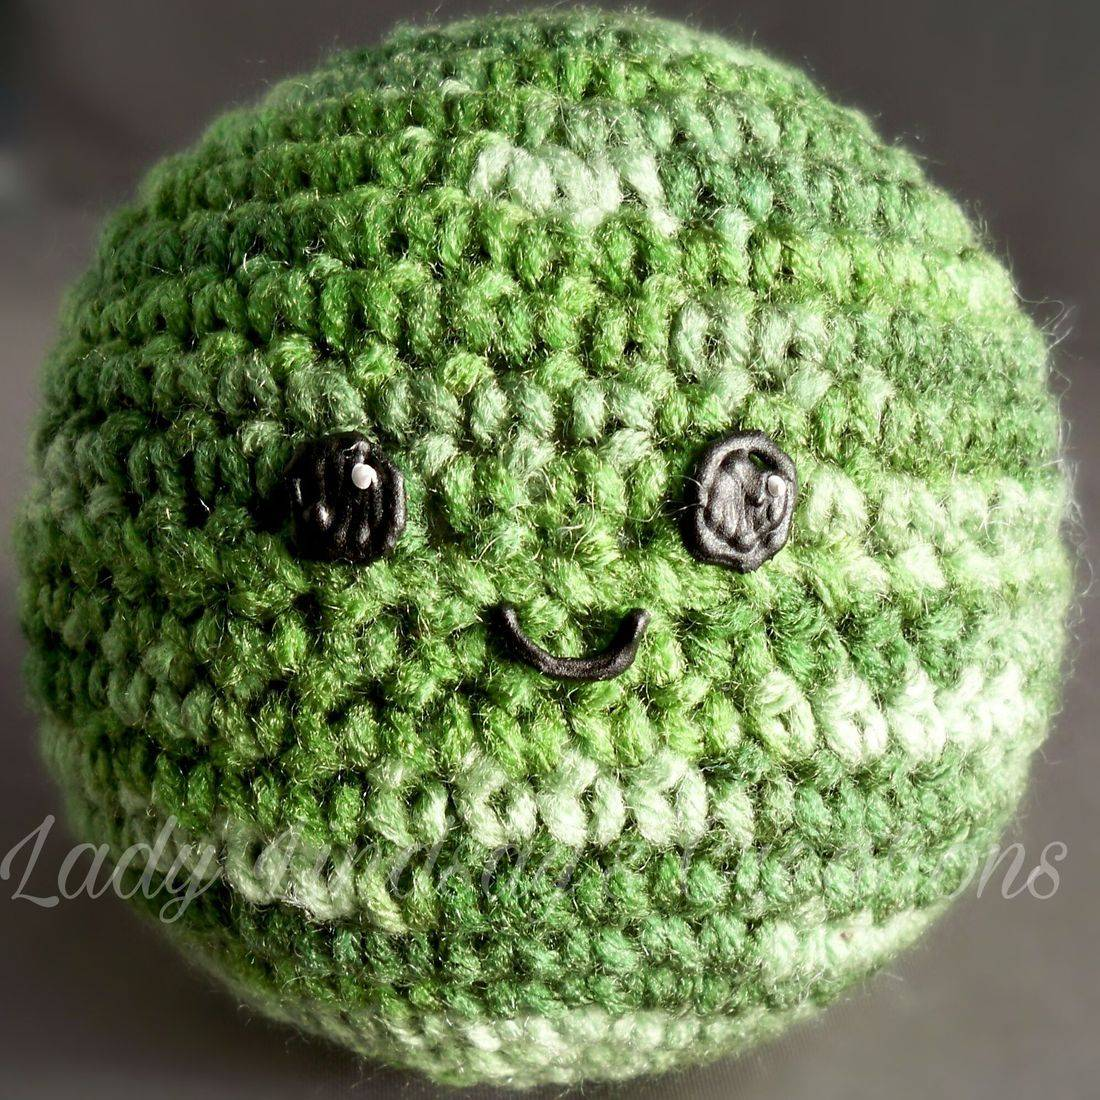 Chibi Planets, Solar system, fantasty, planets, space, kawaii, otaku, cute, handmade, crochet